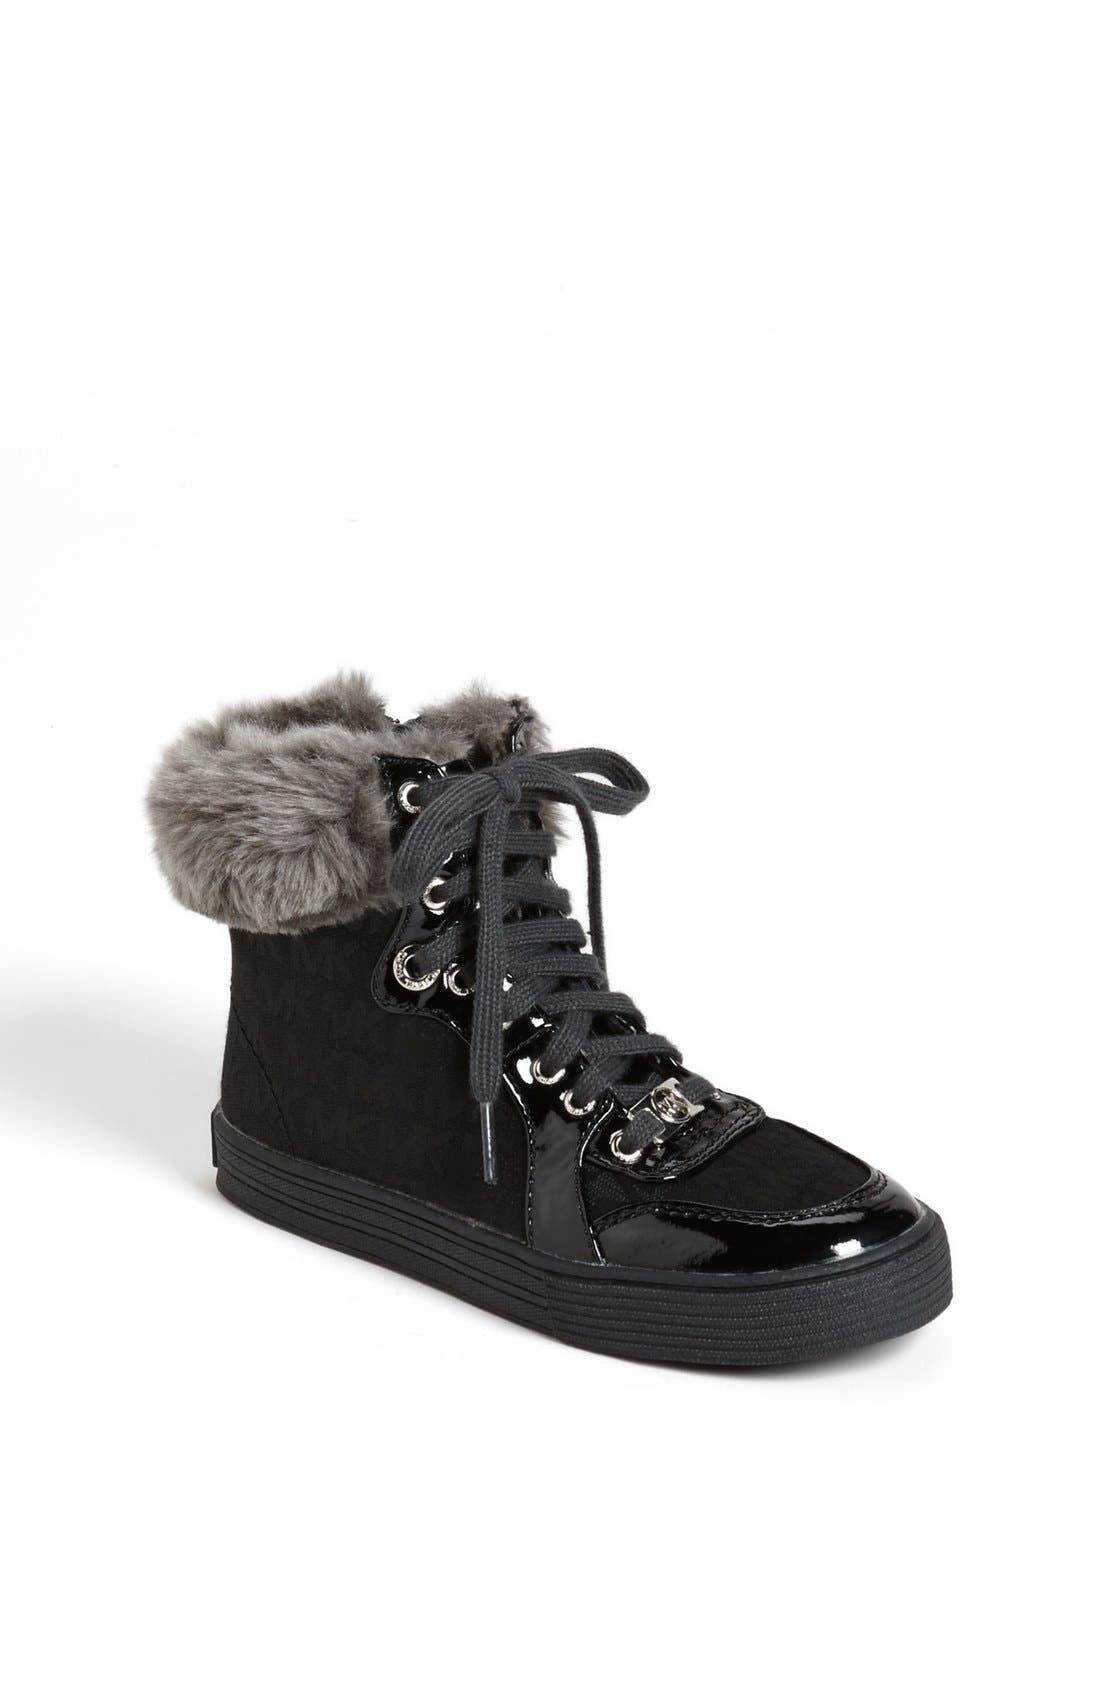 Main Image - MICHAEL Michael Kors 'Ivy' Faux Fur High Top Sneaker (Little Kid)